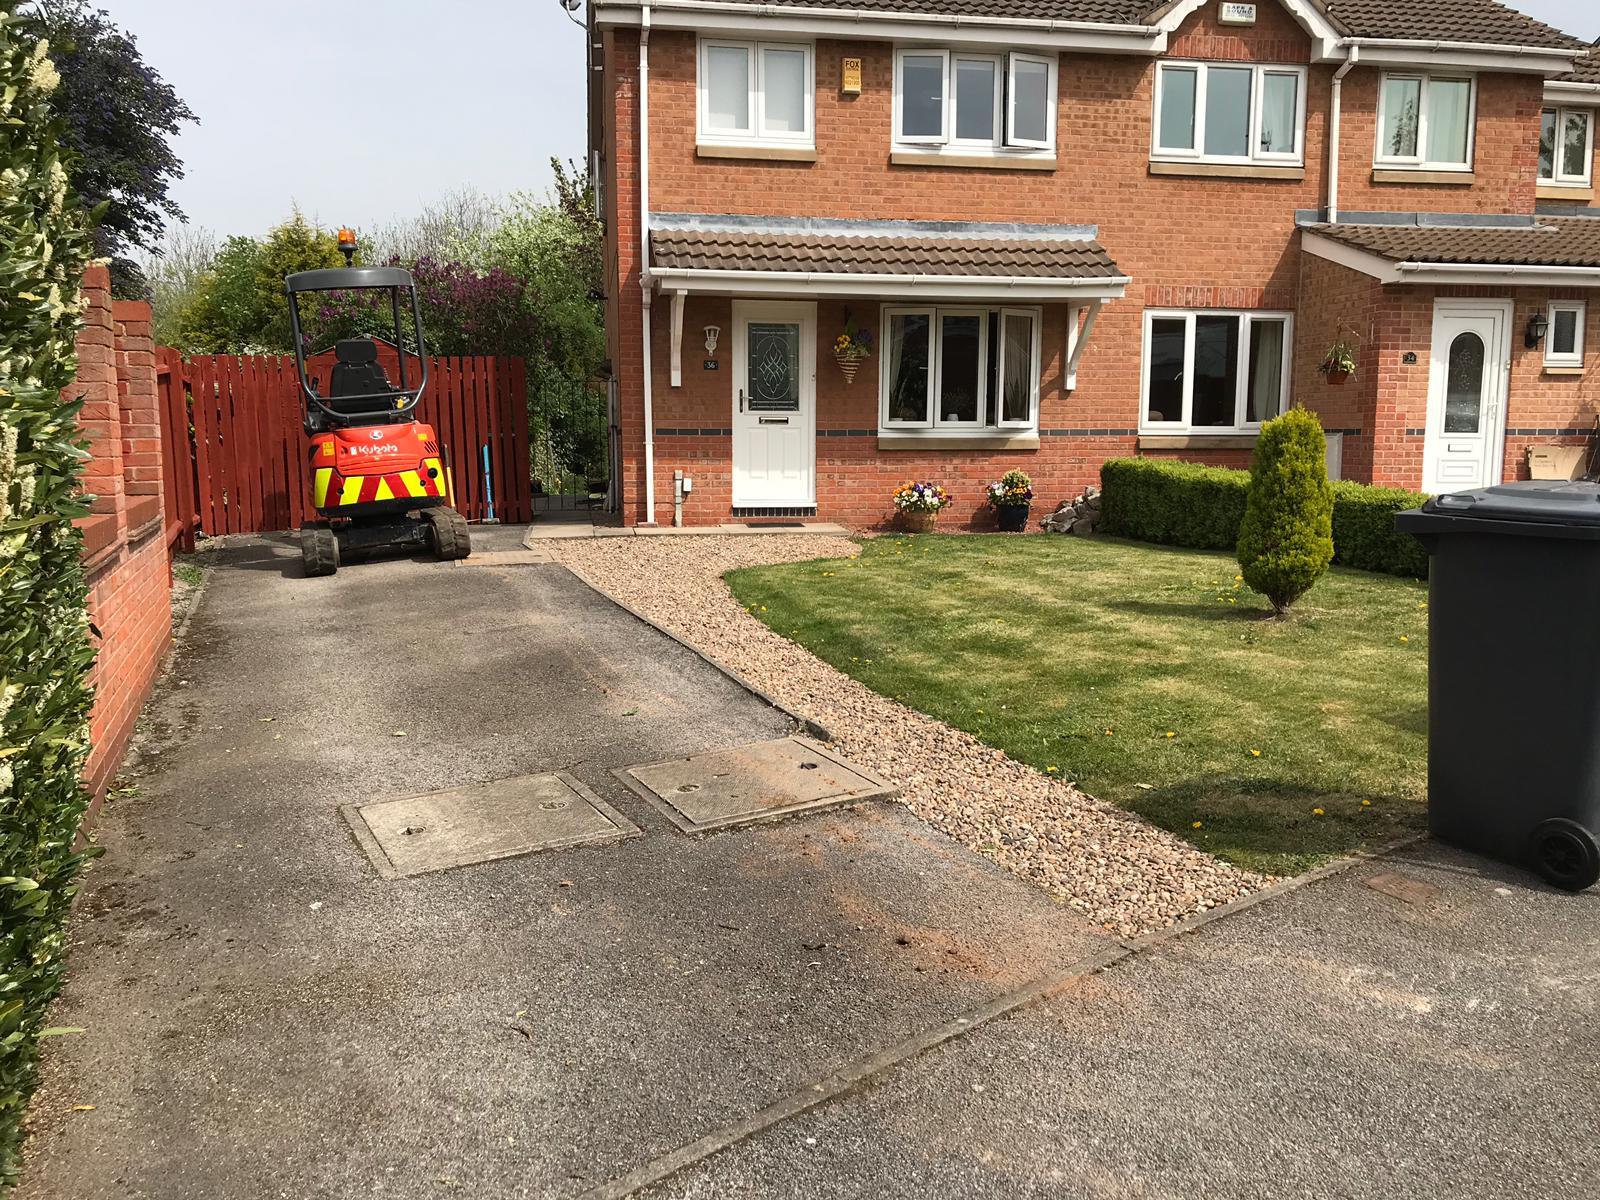 oakfield-drives-nottingham-driveway10-1